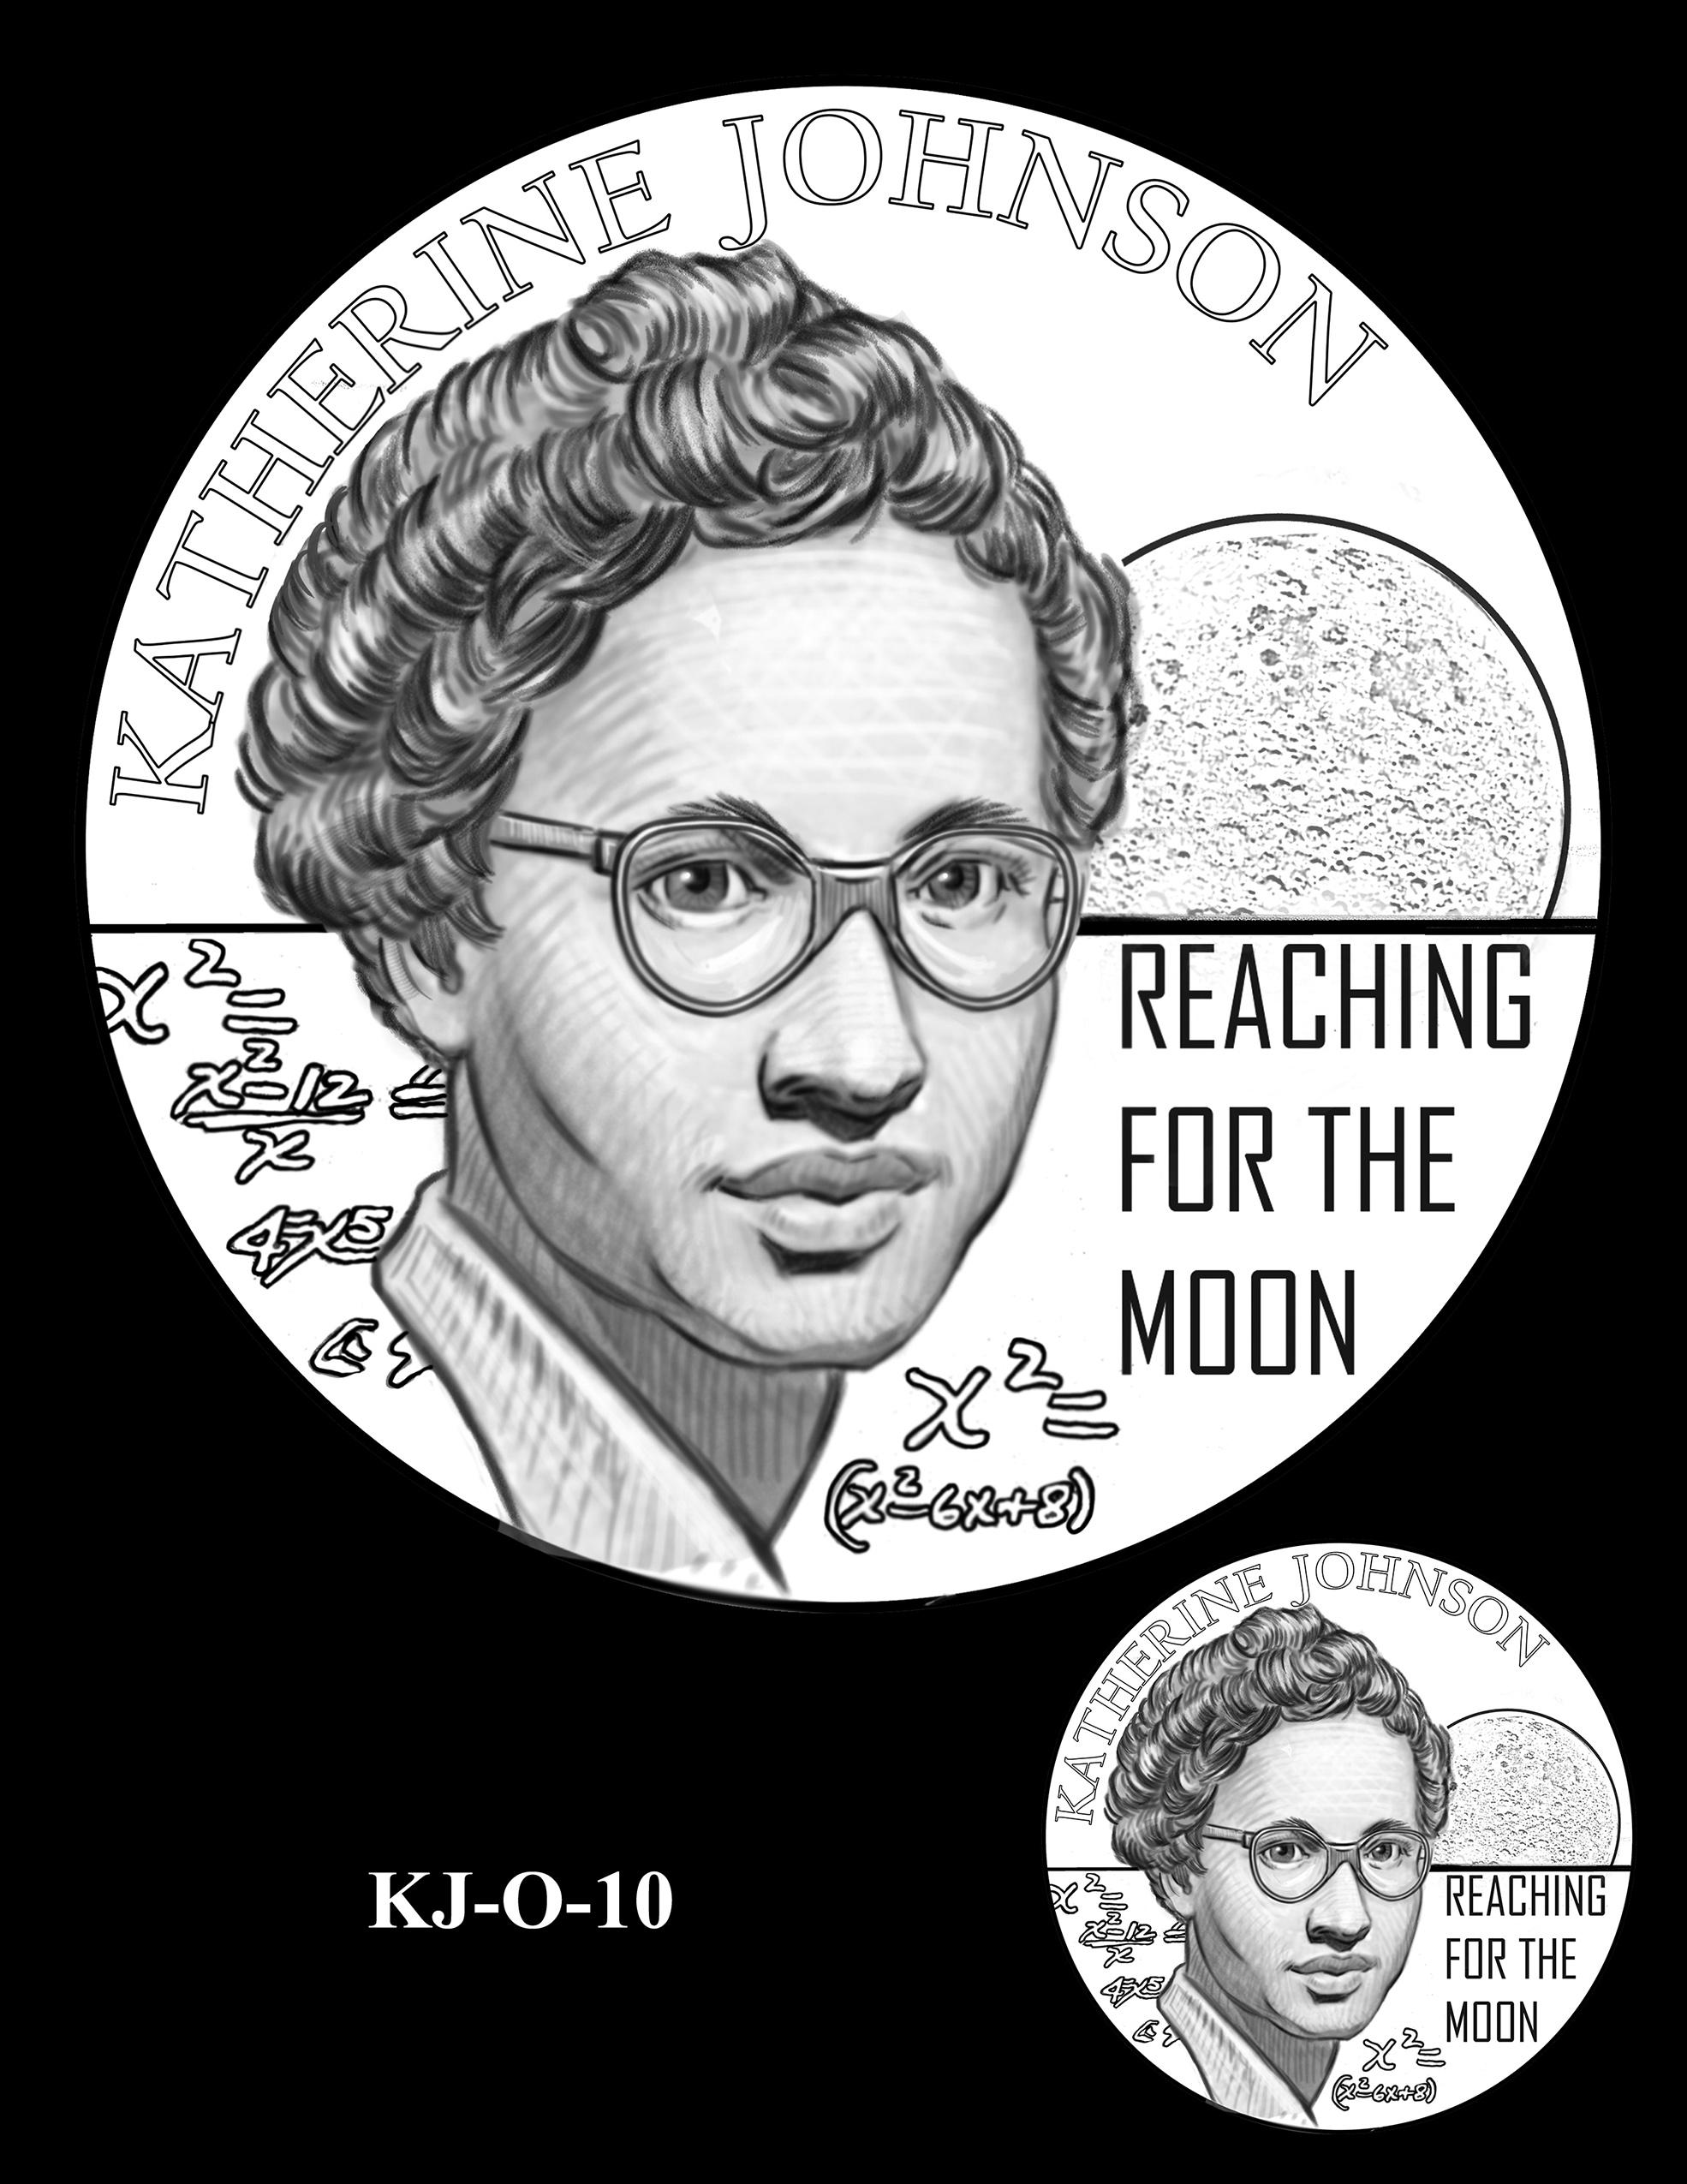 KJ-O-10 -- Katherine Johnson Congressional Gold Medal